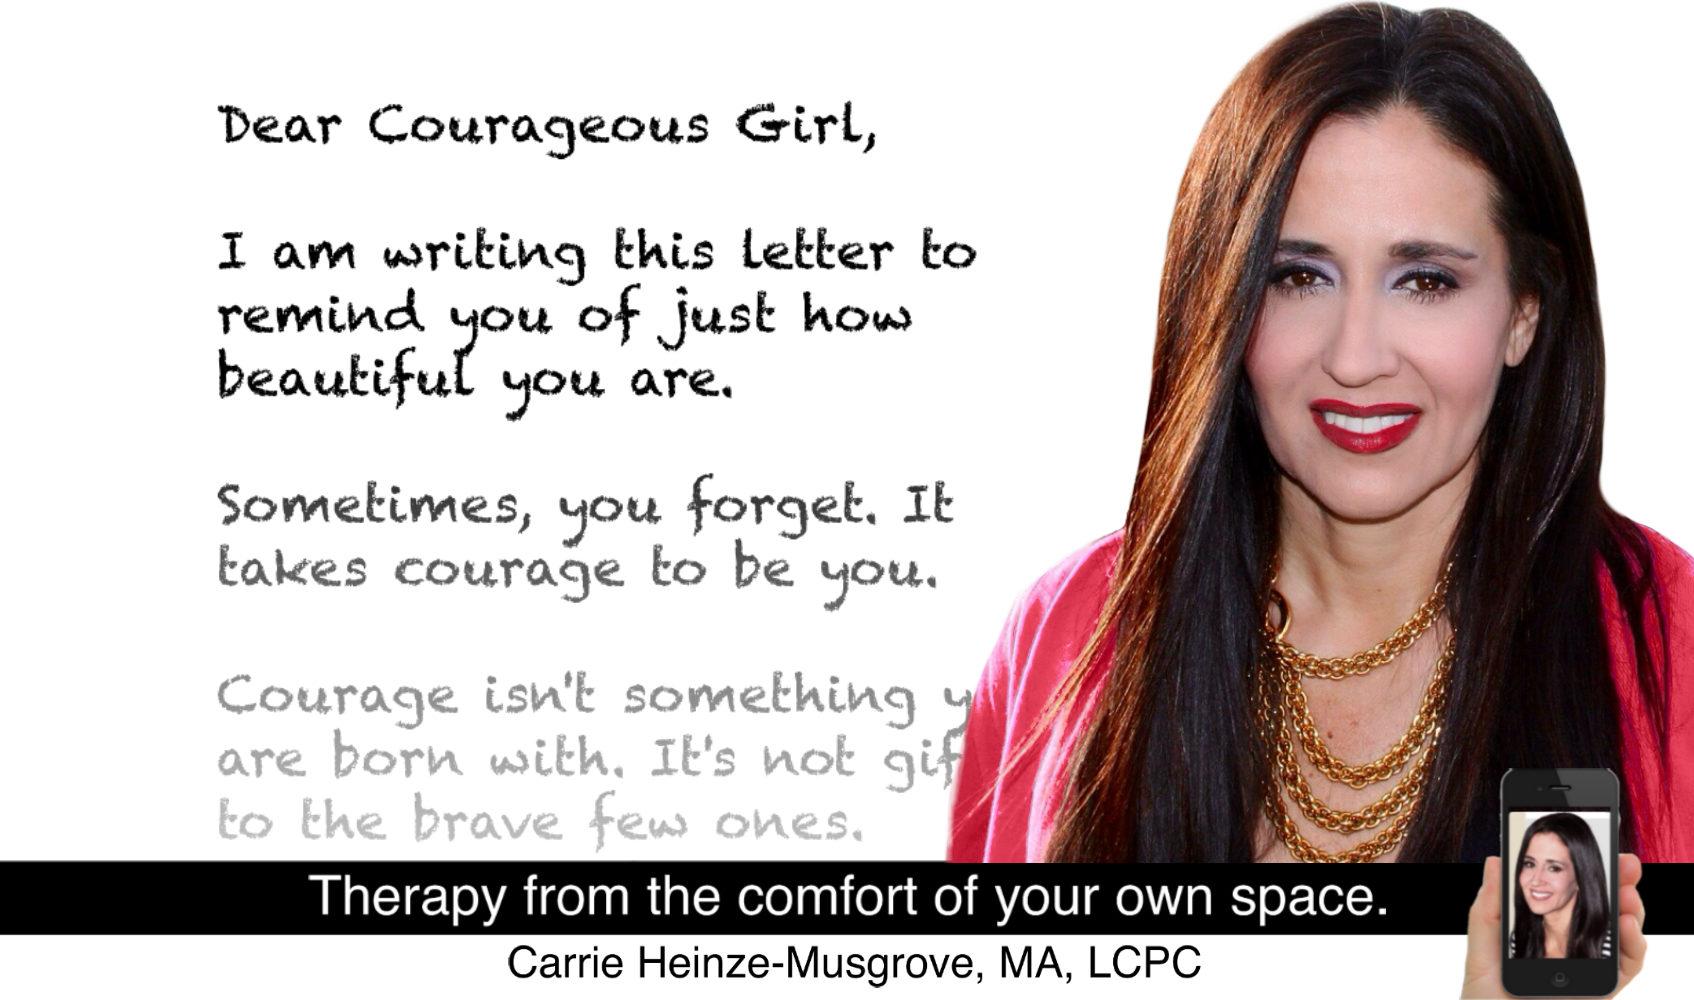 Dear Courageous Girl,